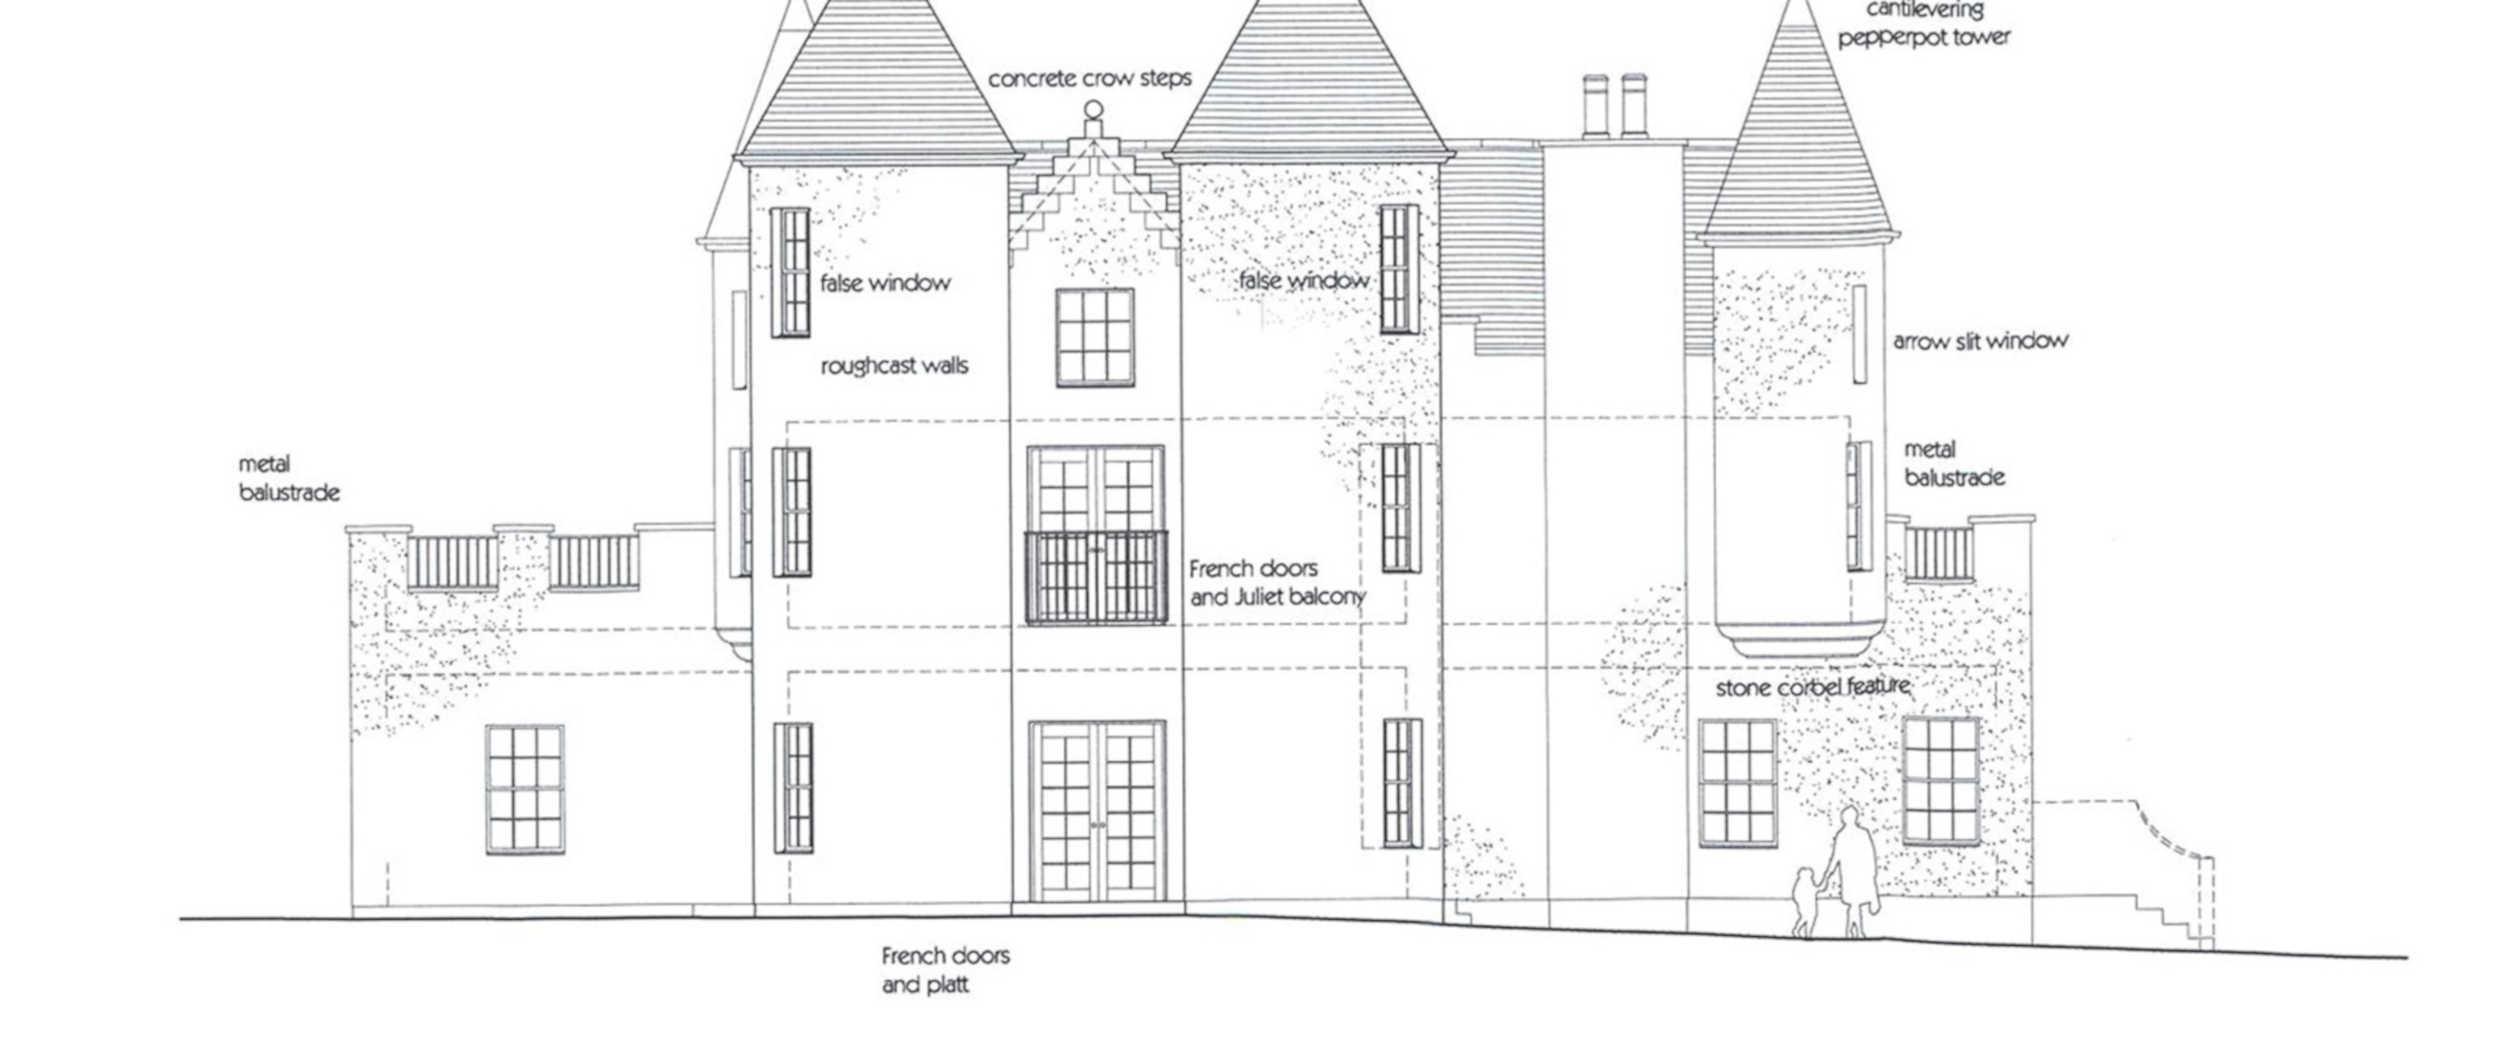 Building plan - Scottish News